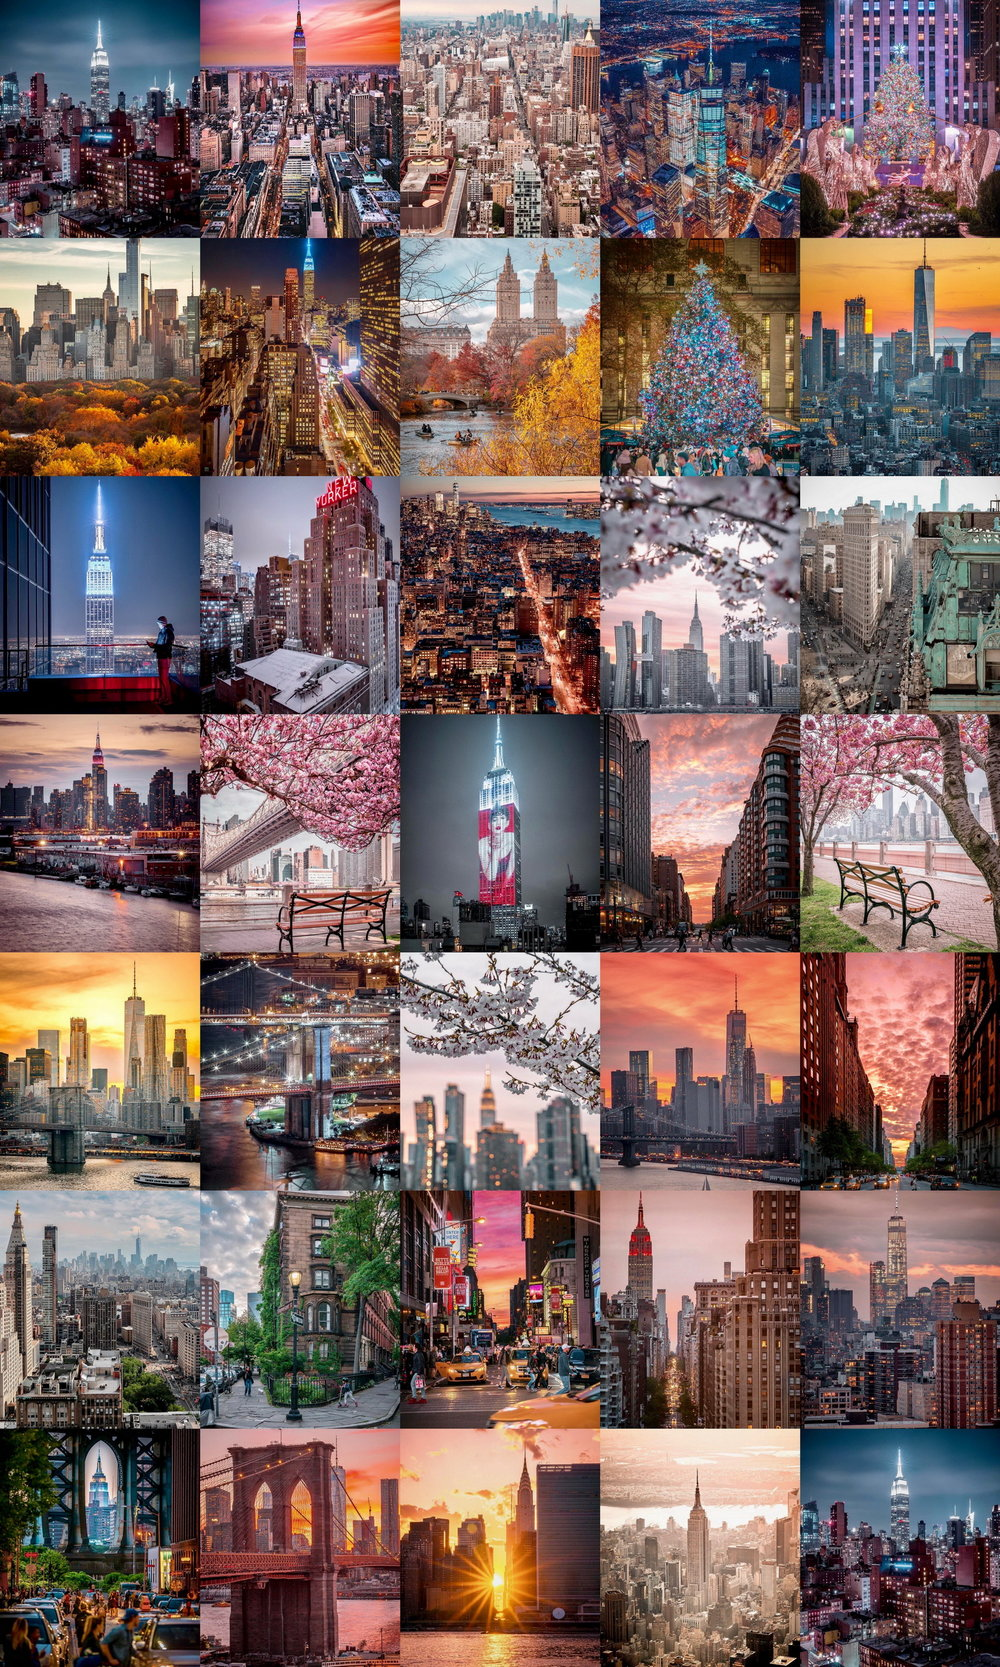 New York by 212sid.jpg